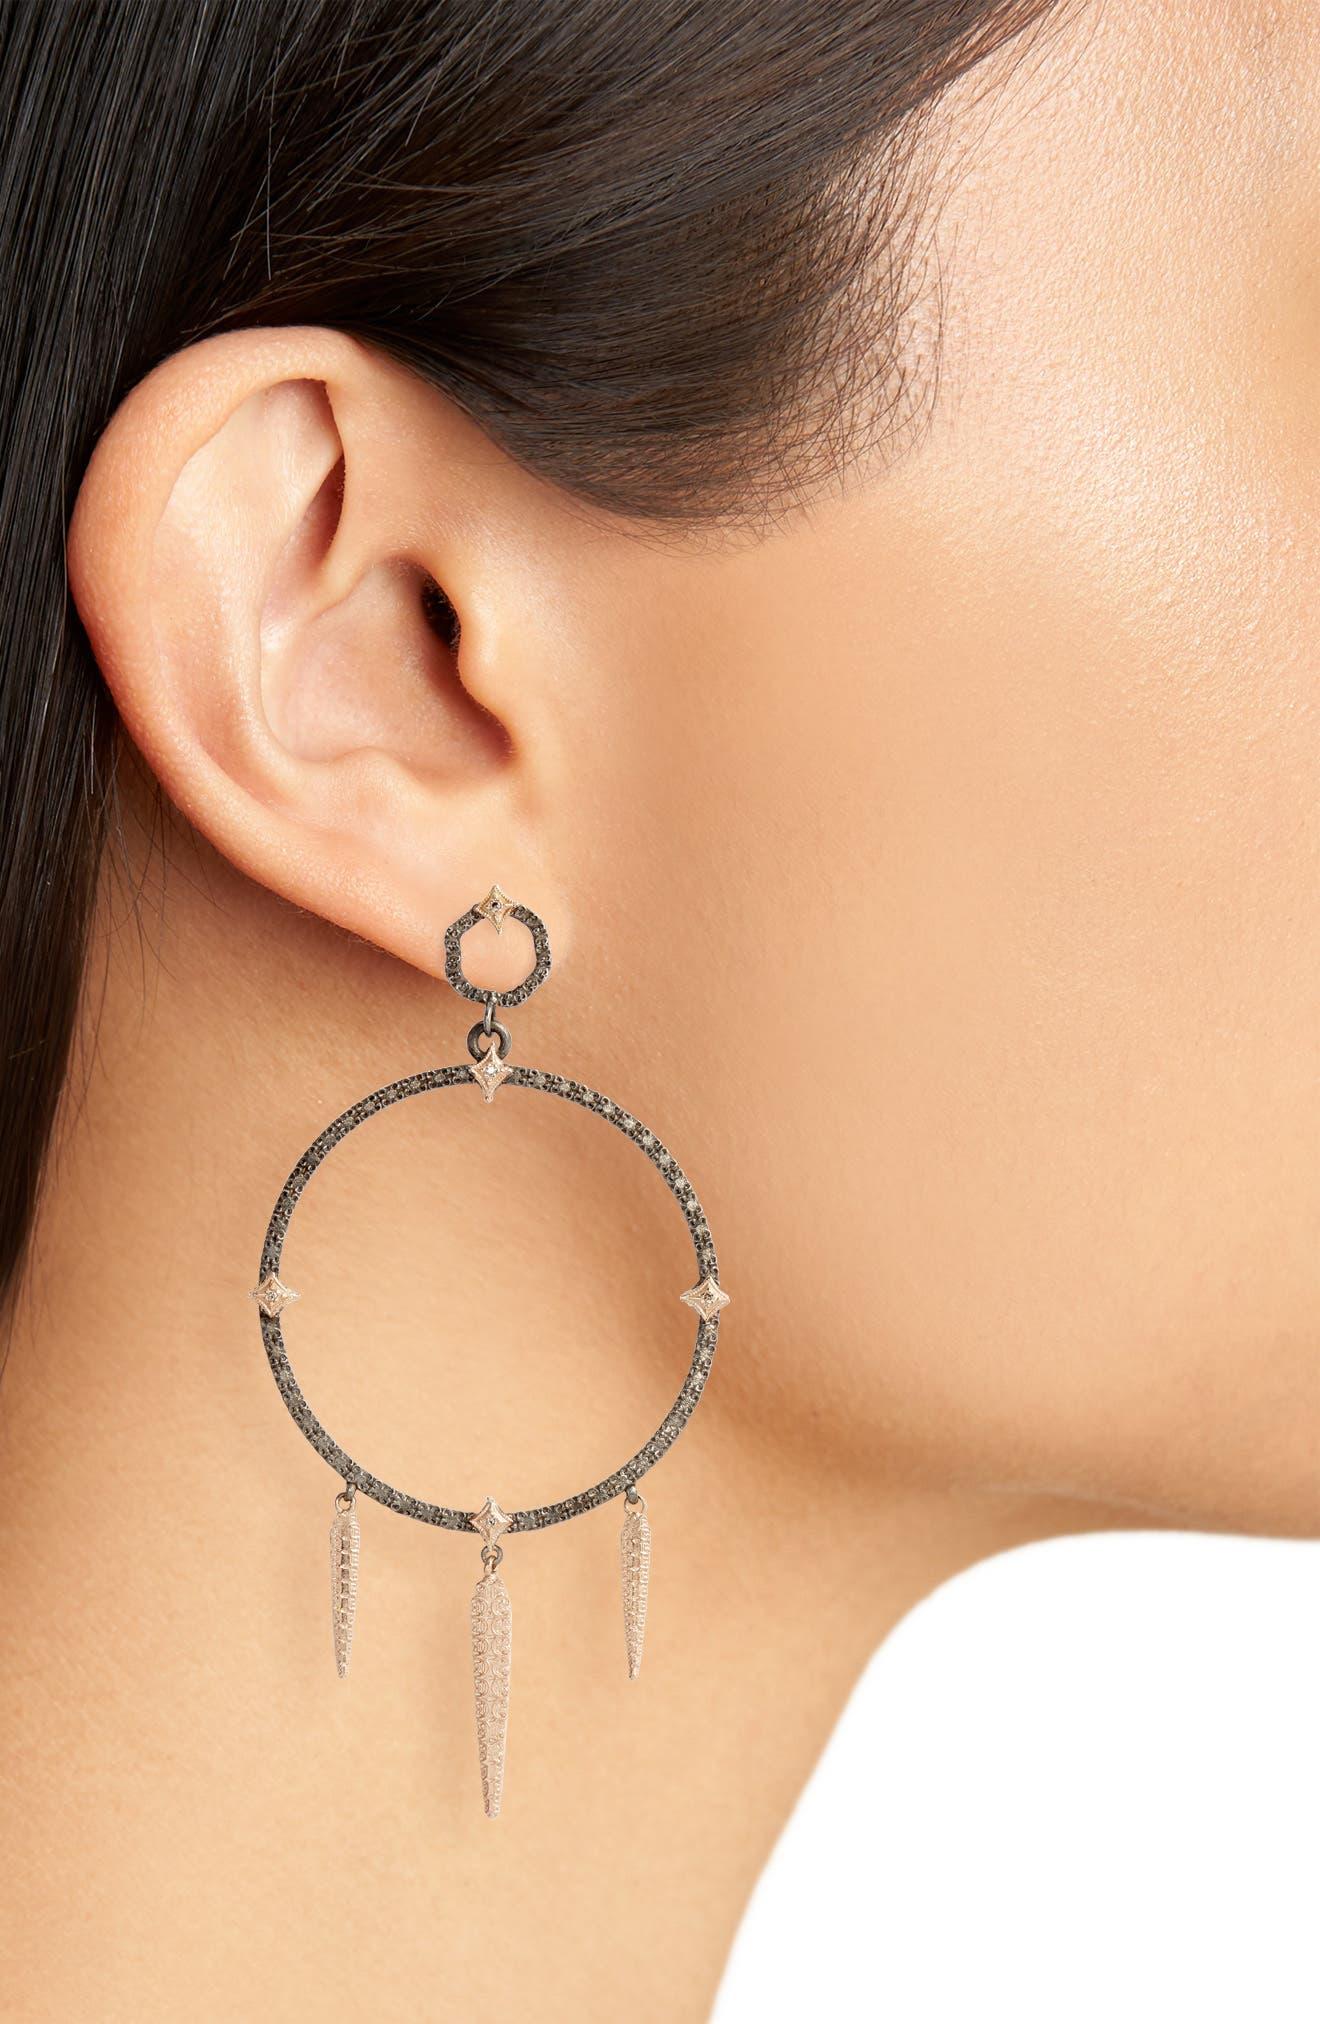 New World Large Circle Dagger Earrings,                             Alternate thumbnail 2, color,                             GOLD/ BLACKENED SILVER